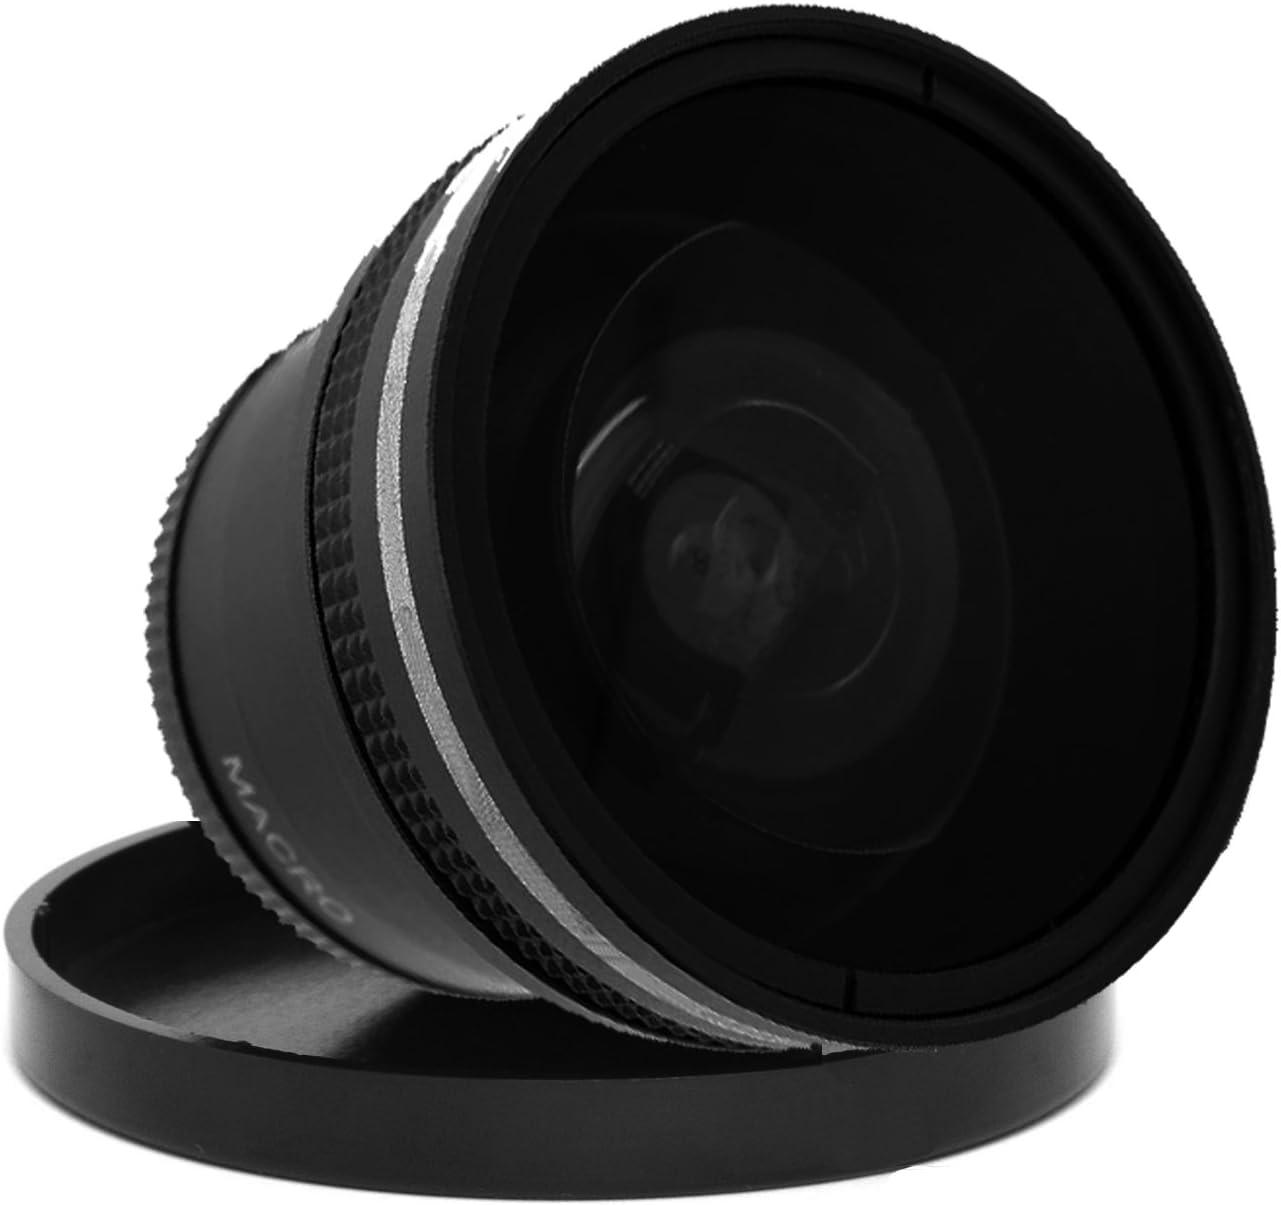 Extreme New sales Fisheye Lens 0.18x For Includes SP-565 UZ Tulsa Mall Olympus